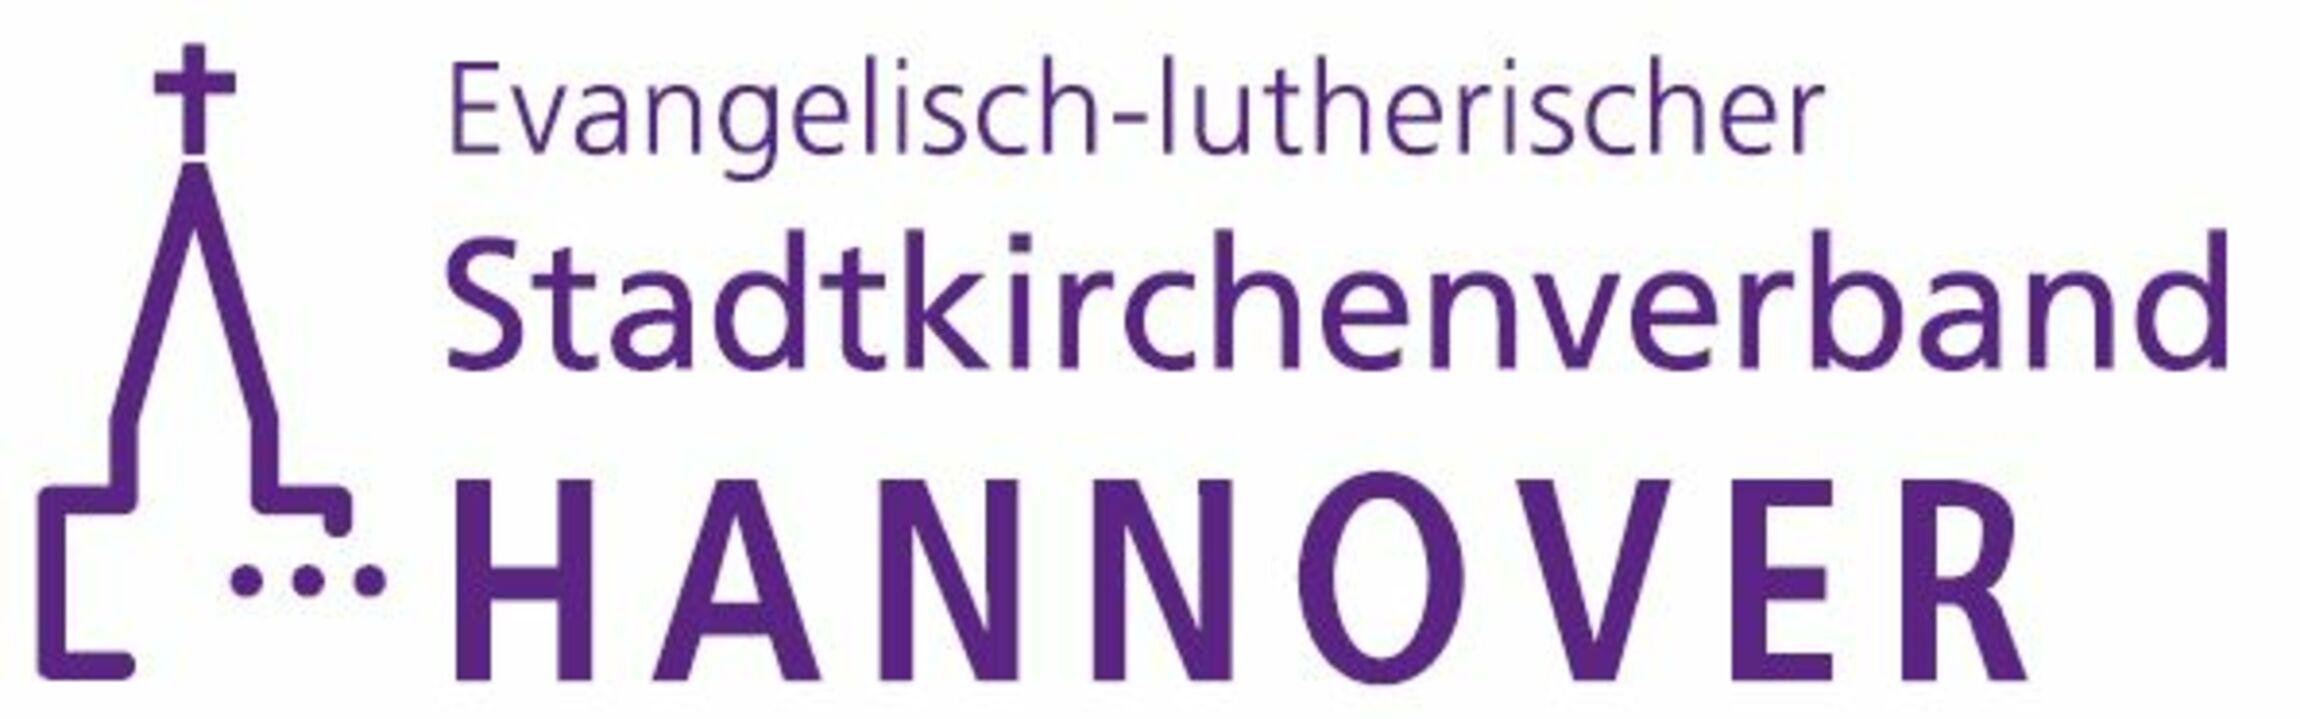 Logo Stadtkirchenverband Hannover